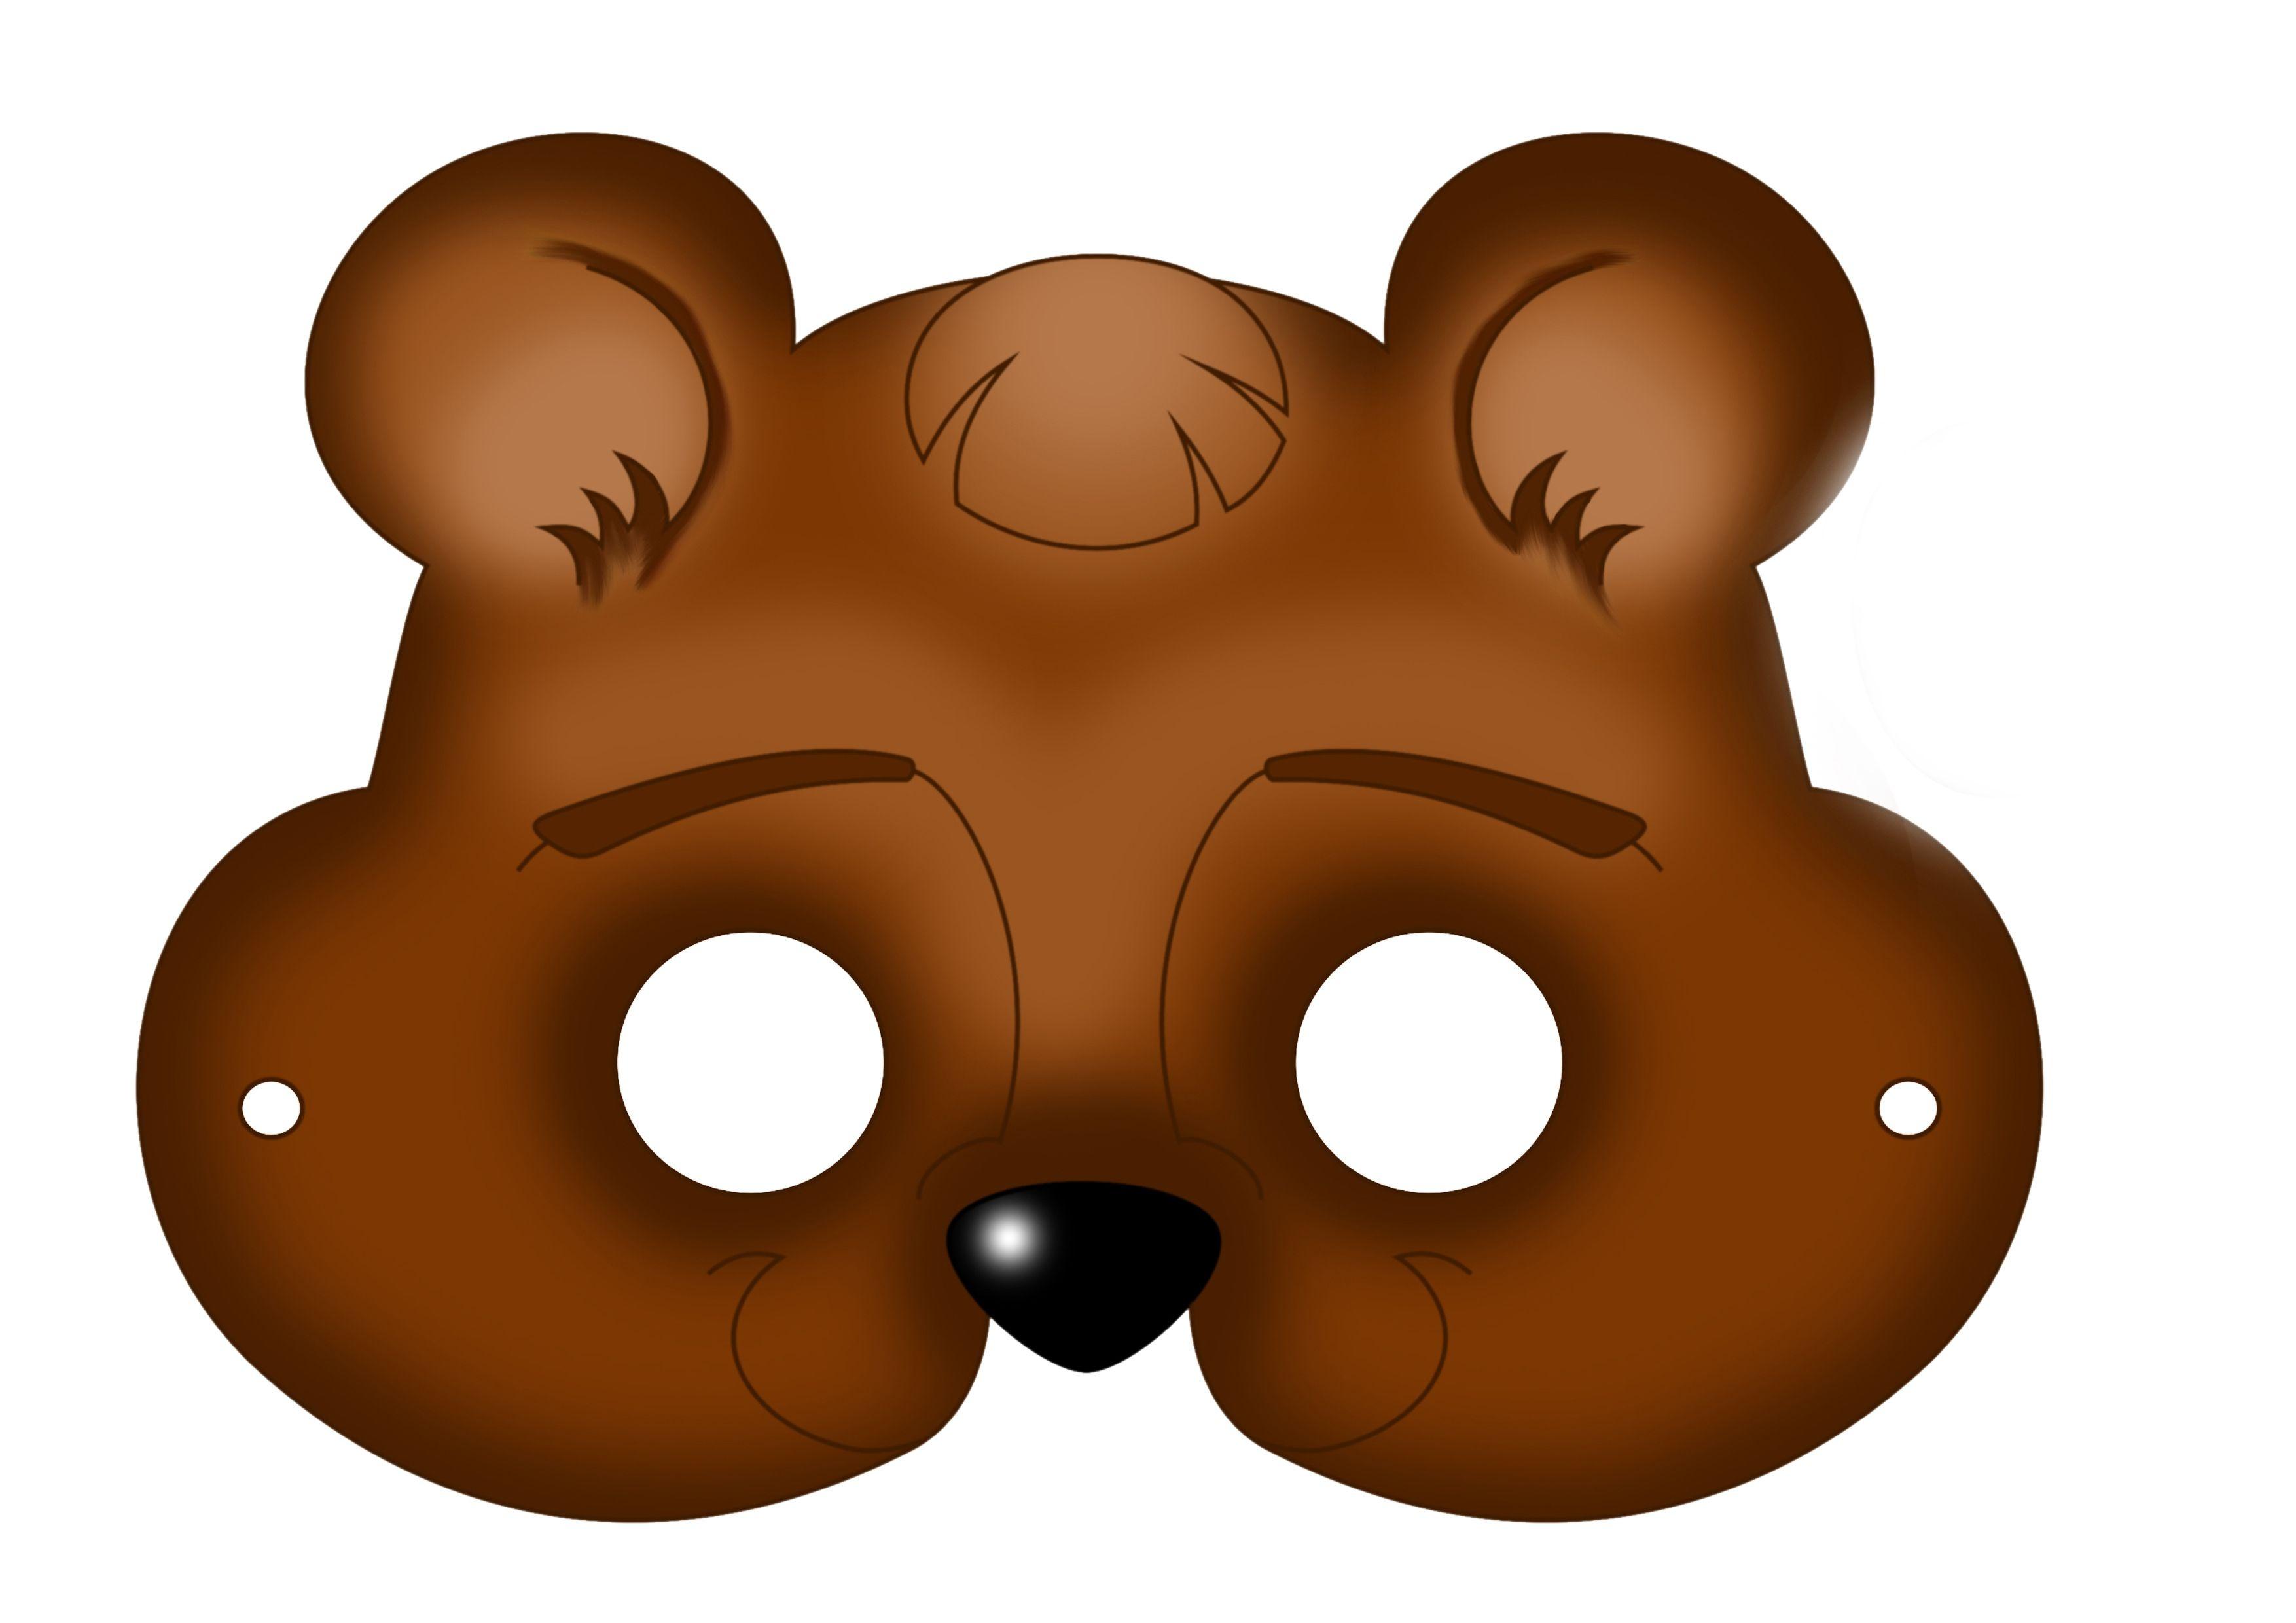 Free Printable Carnival Masks For Kids. | Ideas | Bear Mask, Mask - Free Printable Chipmunk Mask